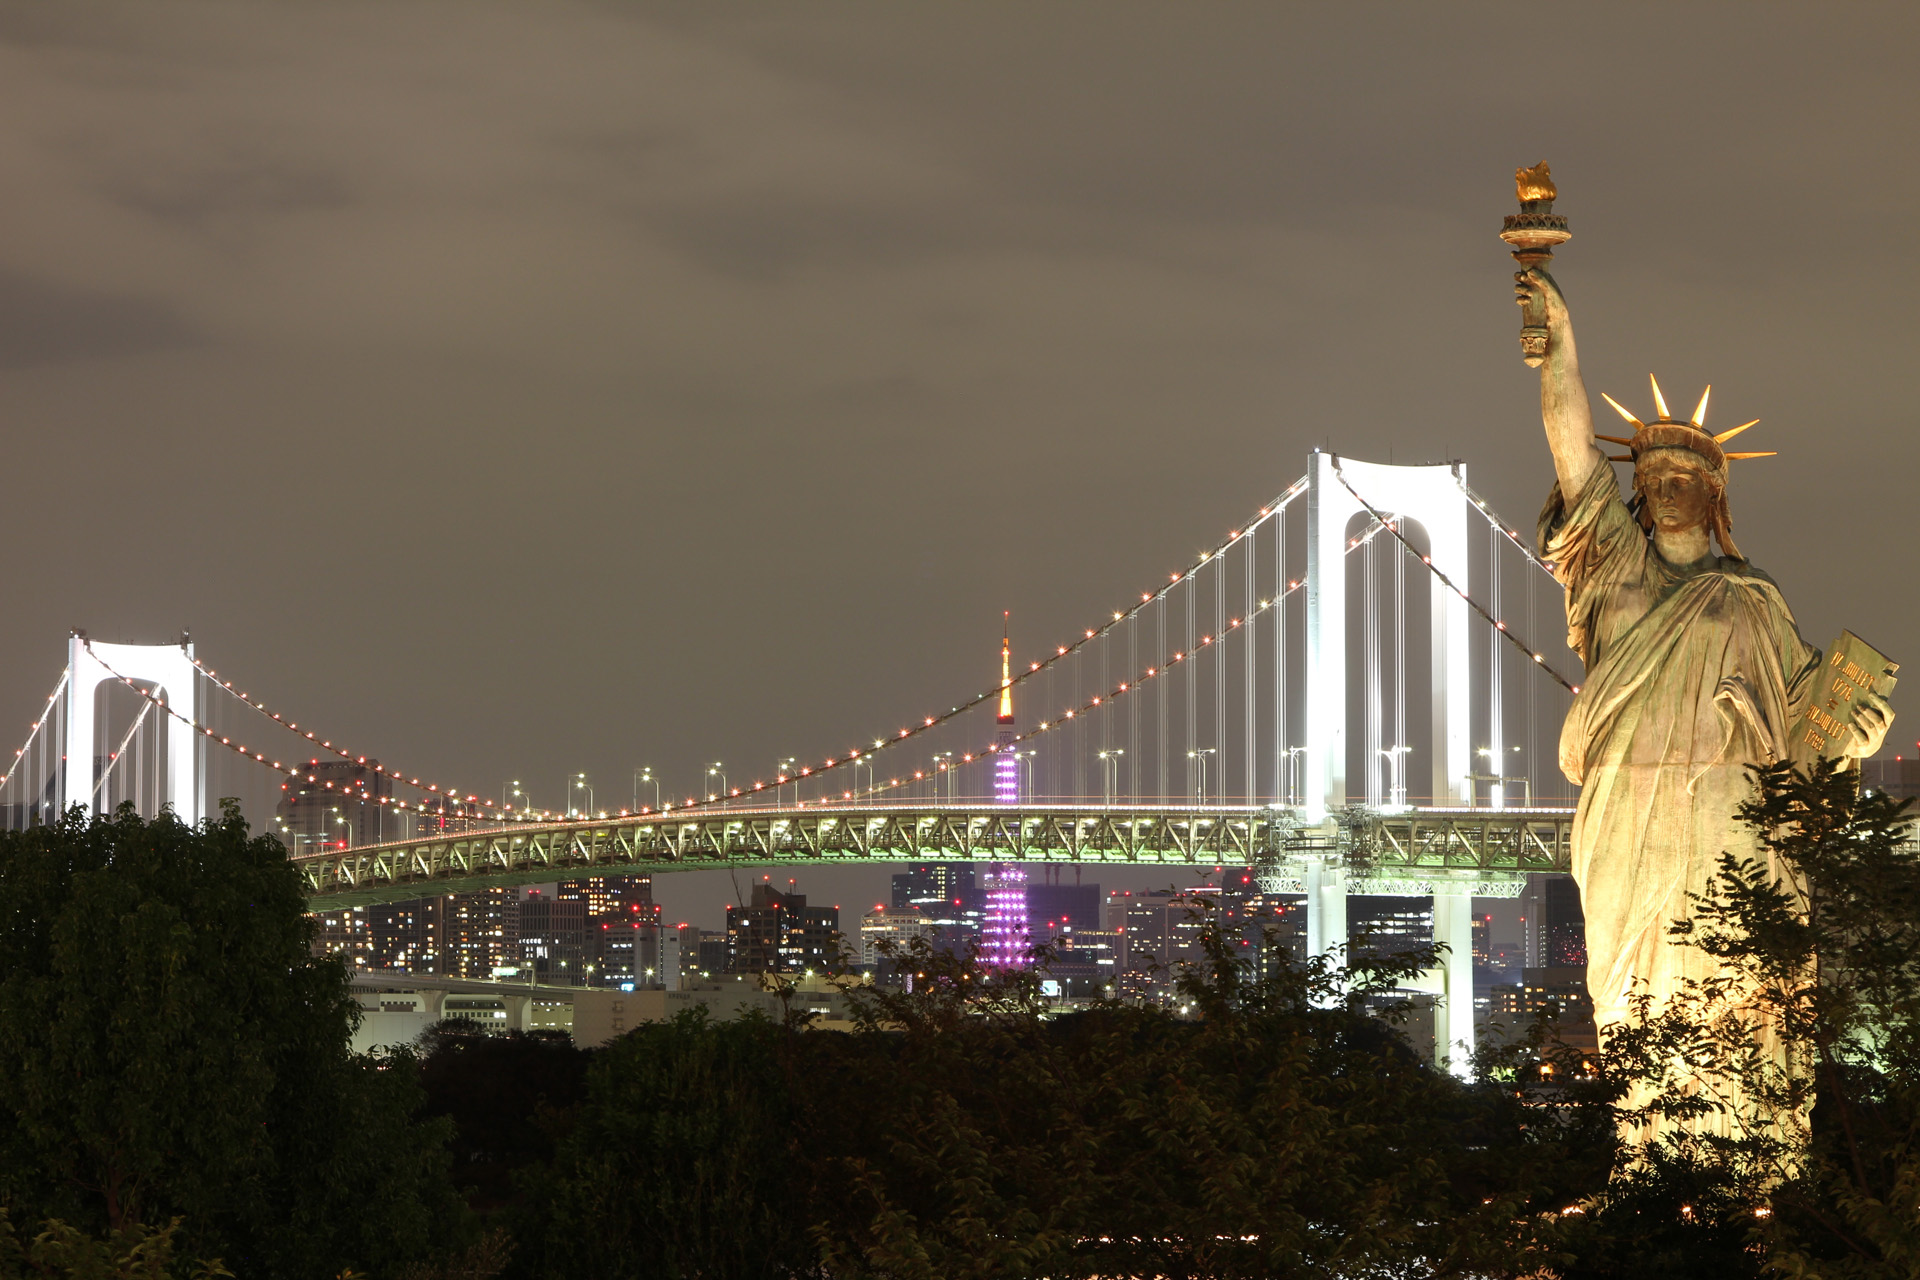 12. Samsung_New York.jpg